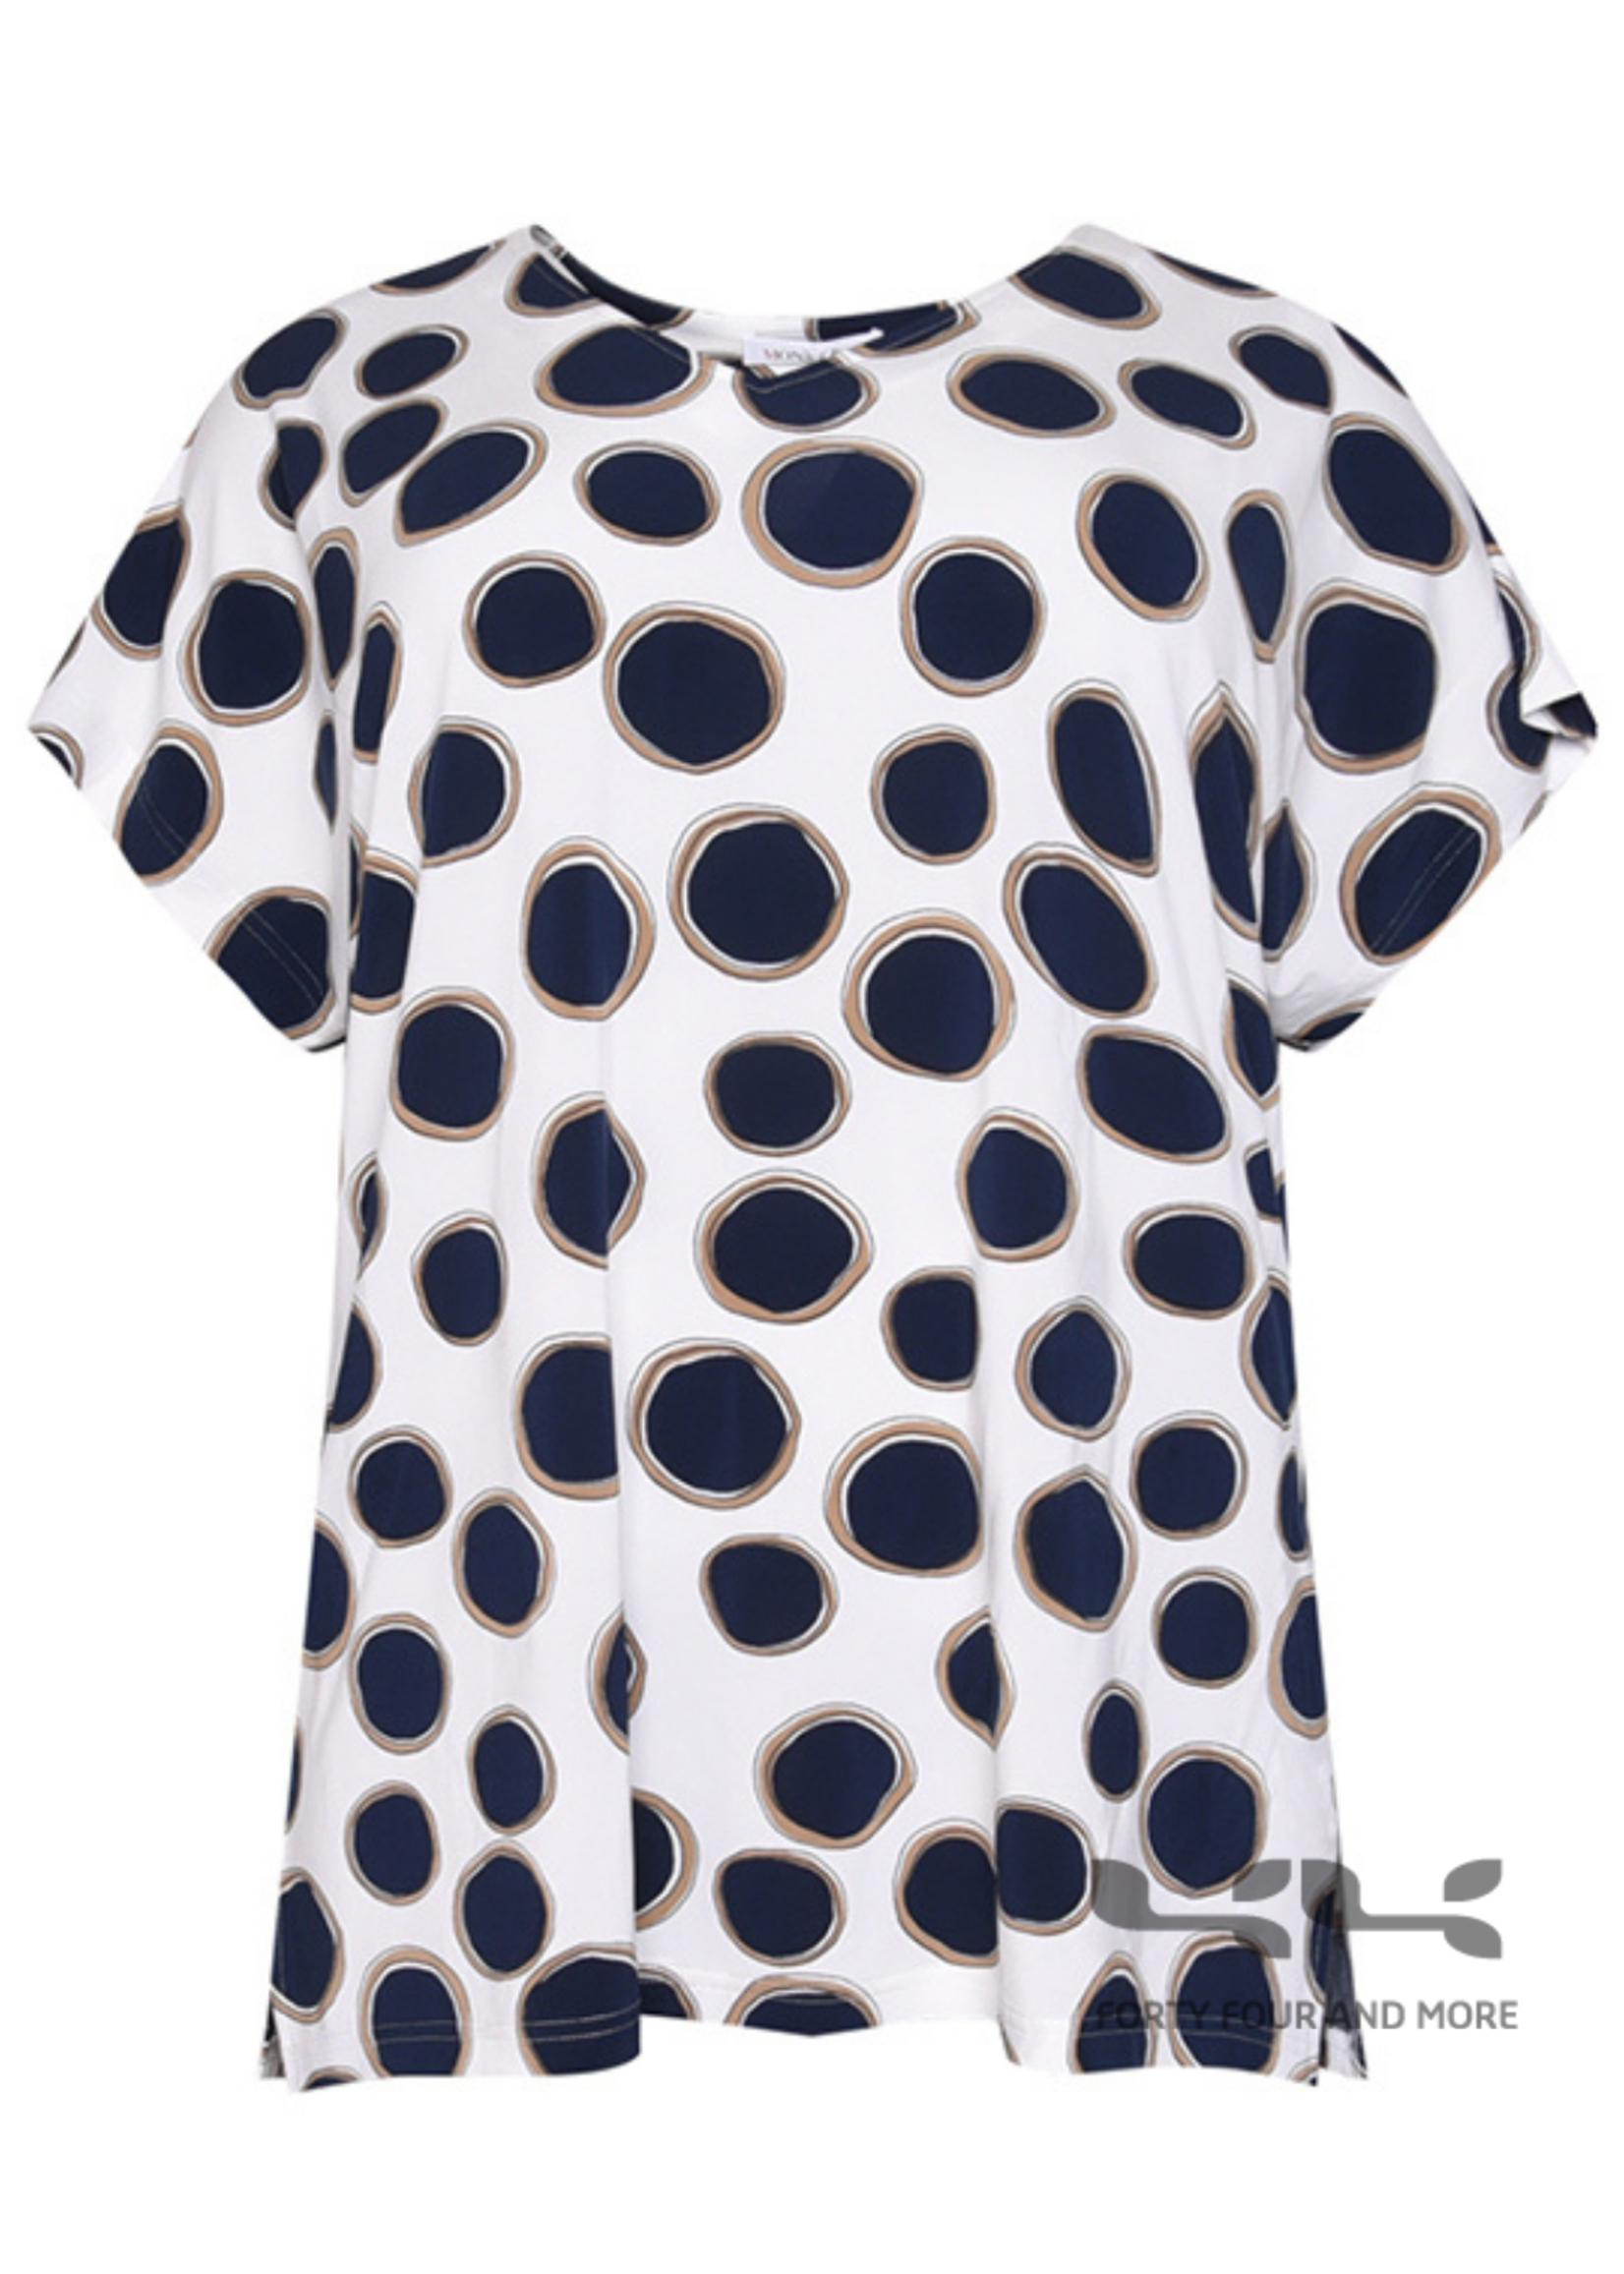 Mona LIsa Shirt met bollenprint